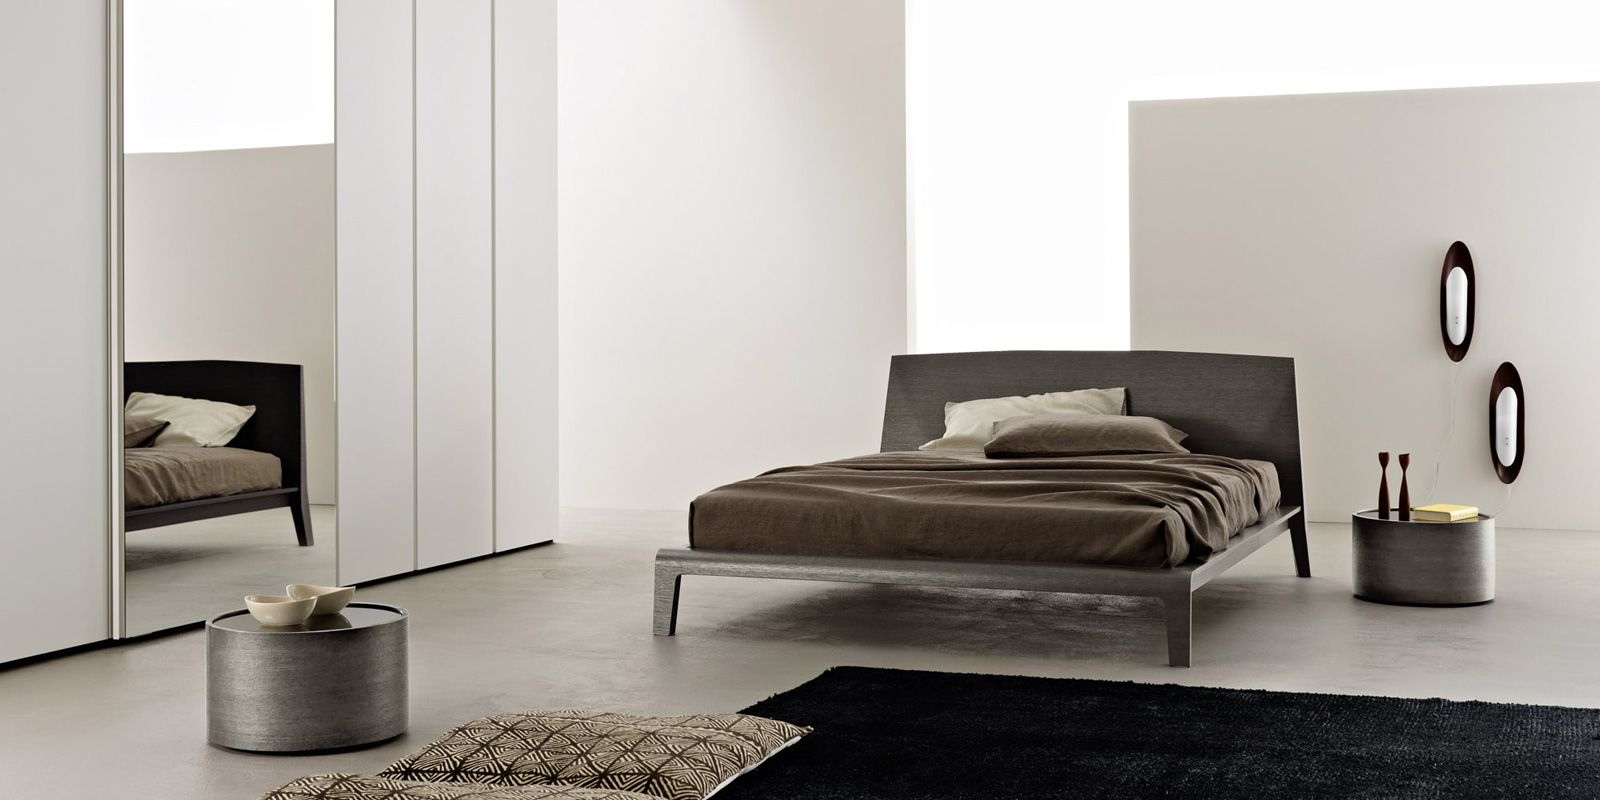 cloe bed by sangiacomo   spaces of interest   pinterest   custom ... - Camera Da Letto San Giacomo